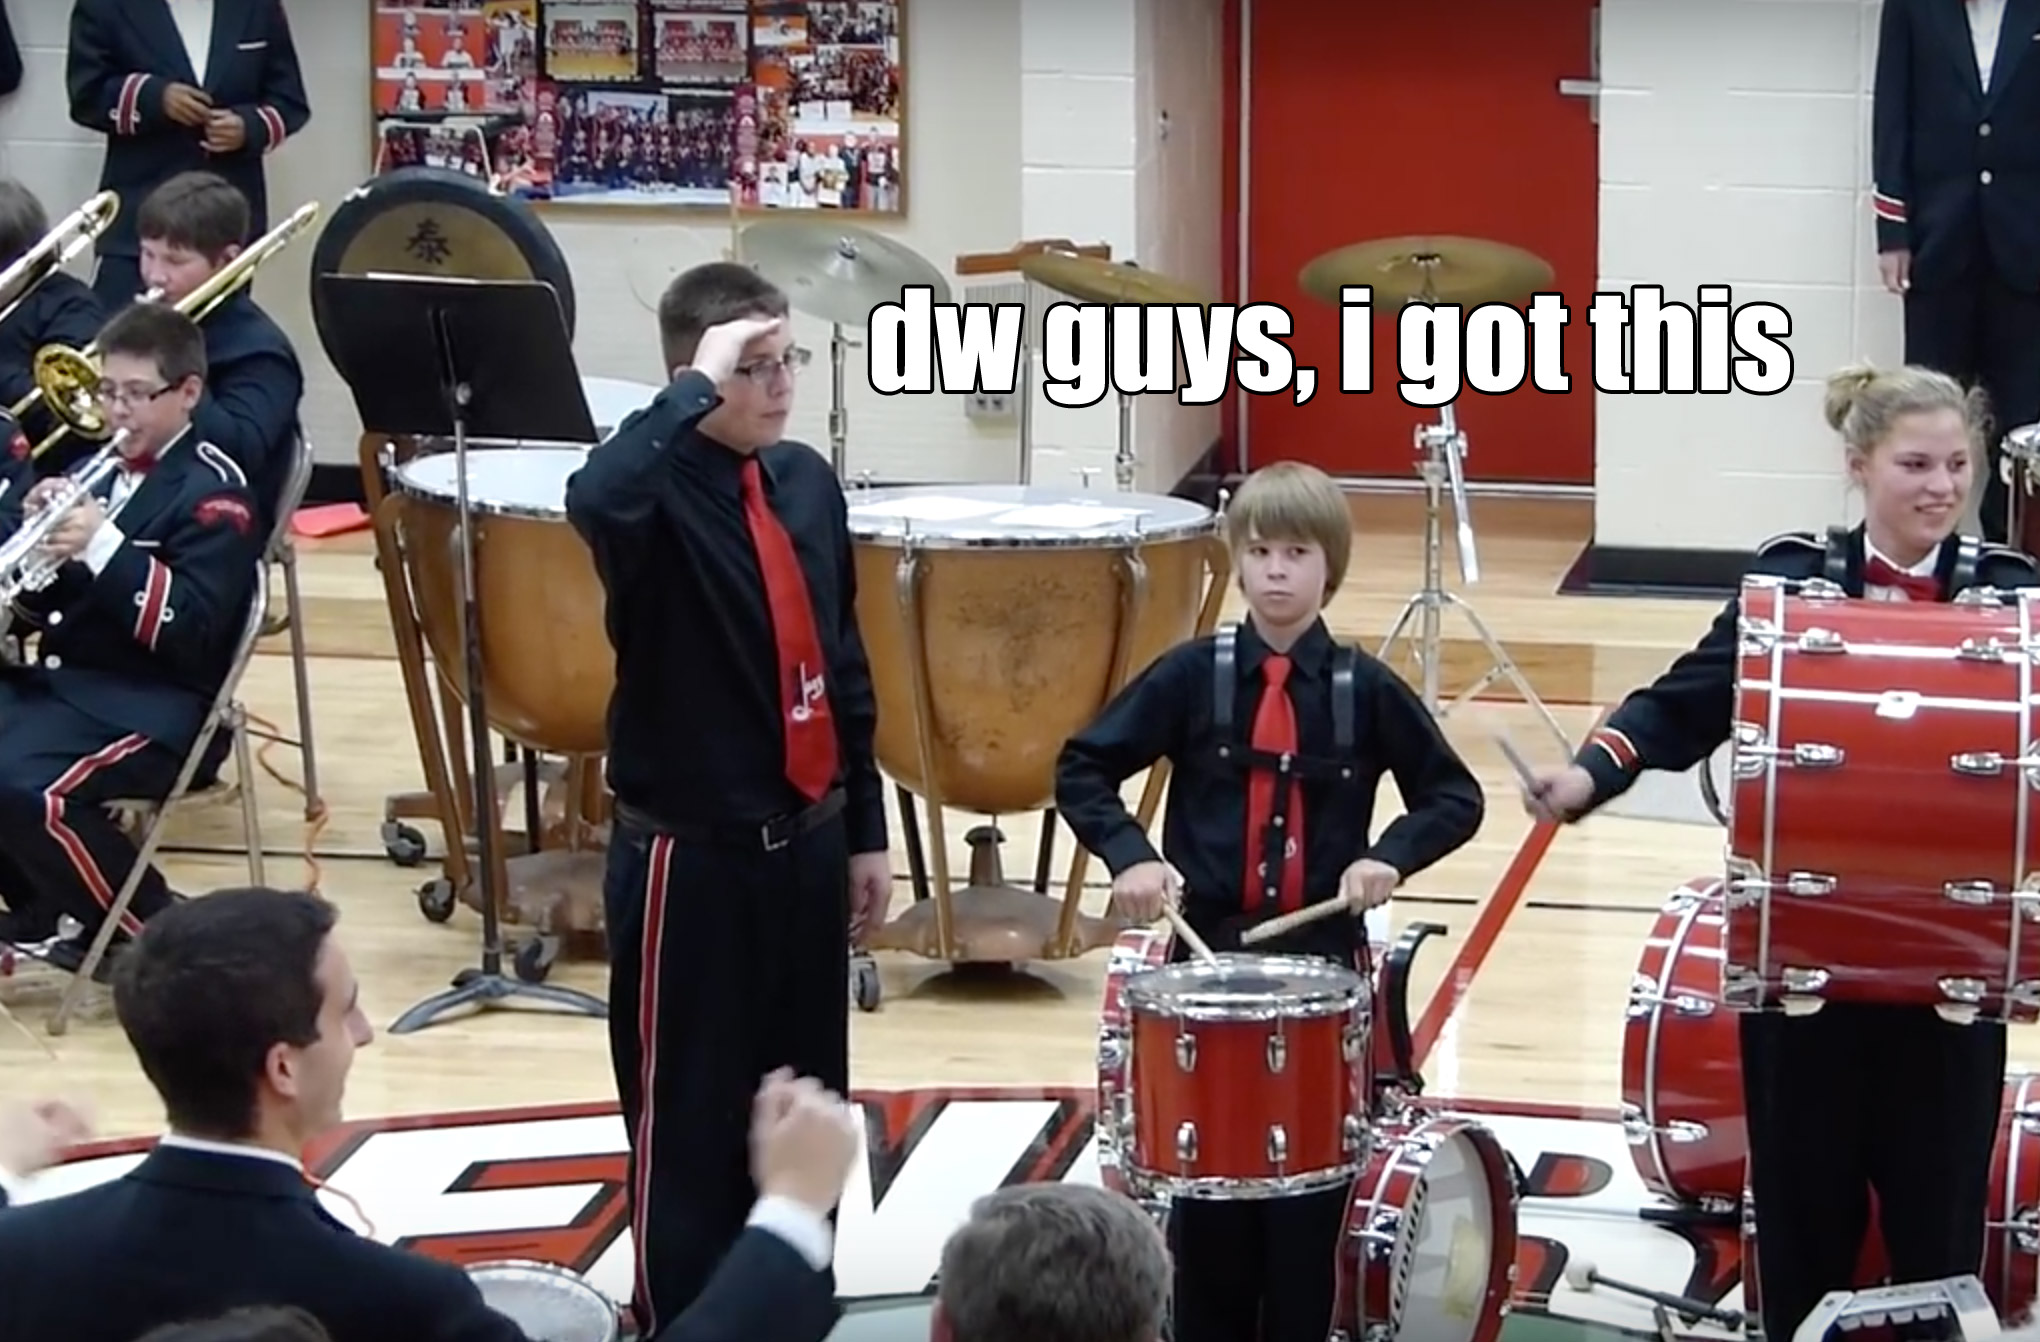 Cymbal crash - after